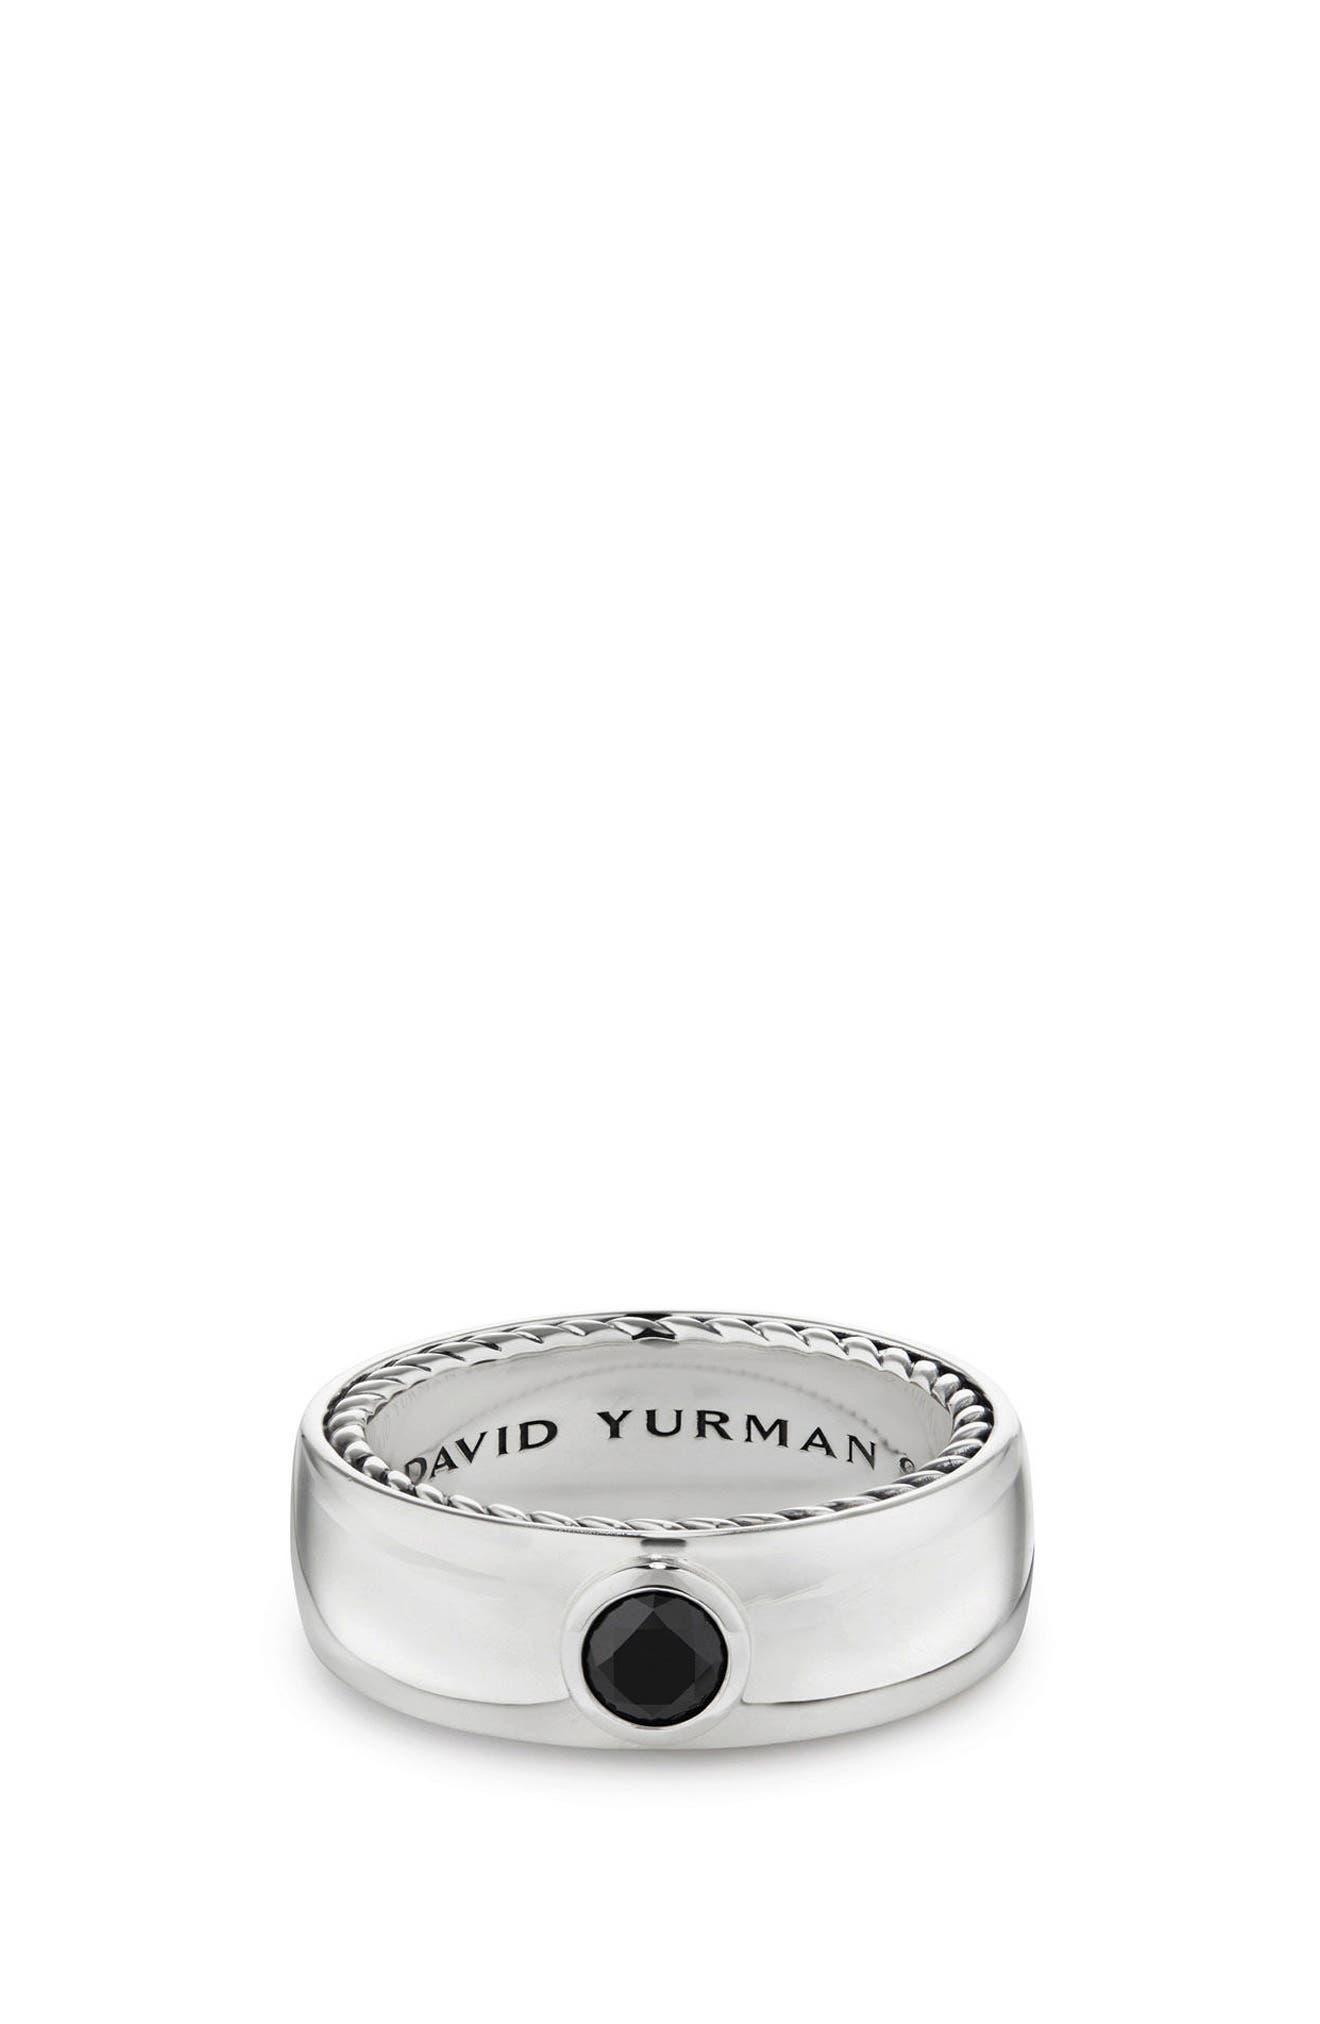 David Yurman Streamline Band Ring with Black Diamond, 6mm